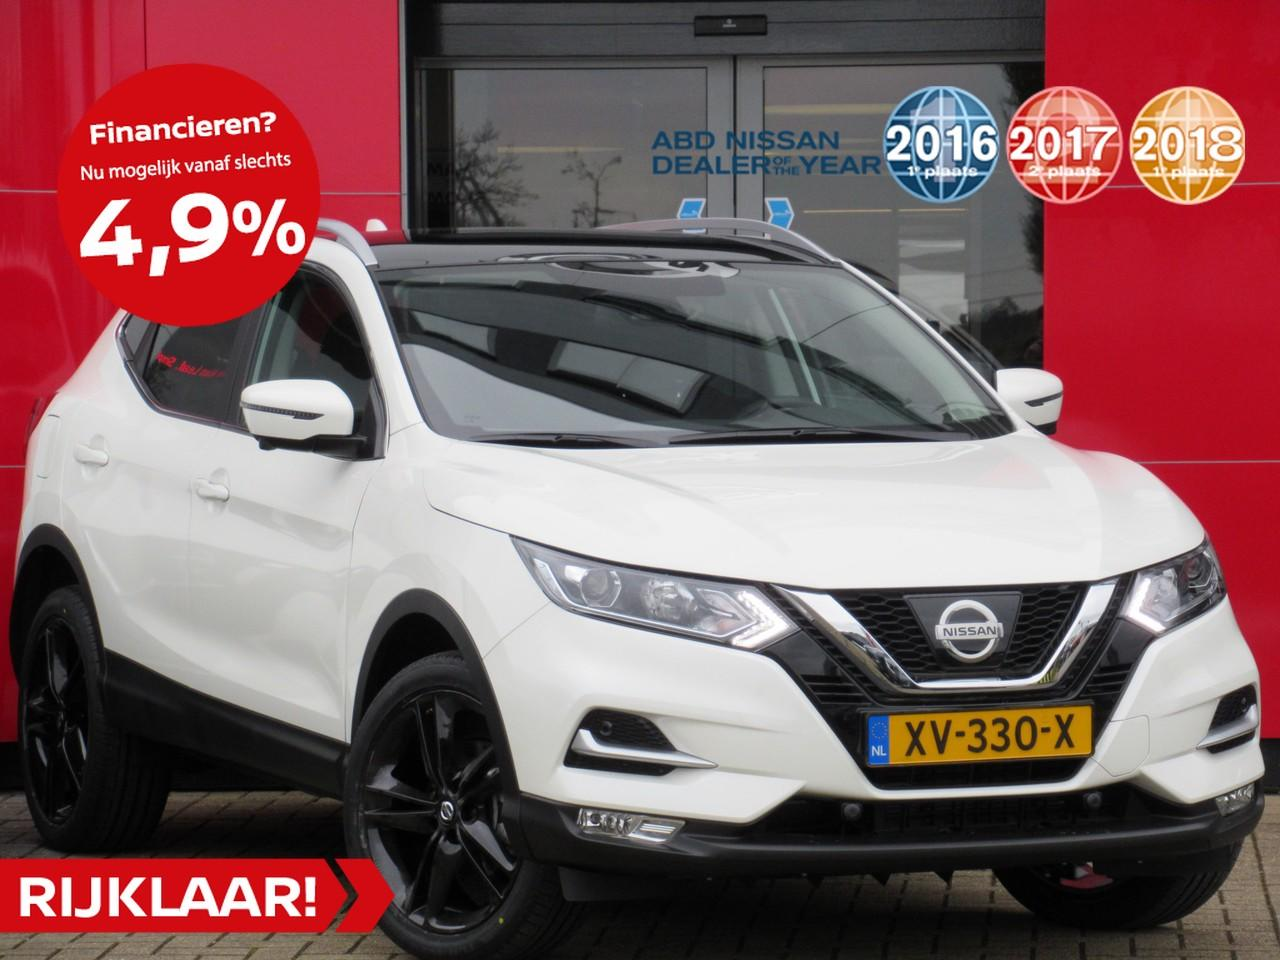 Nissan Qashqai Dig-t 163pk n-connecta €5.000,- euro korting